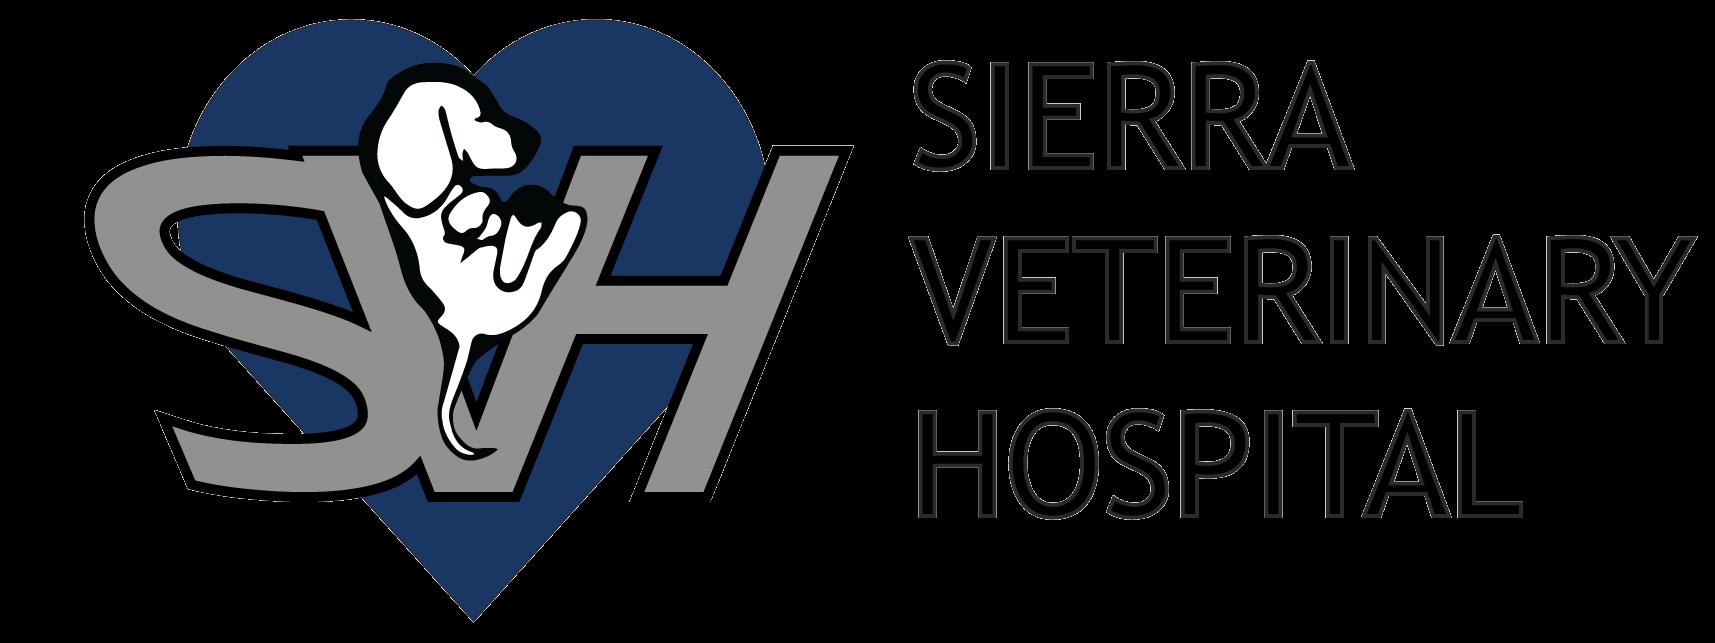 Sierra Veterinary Hospital